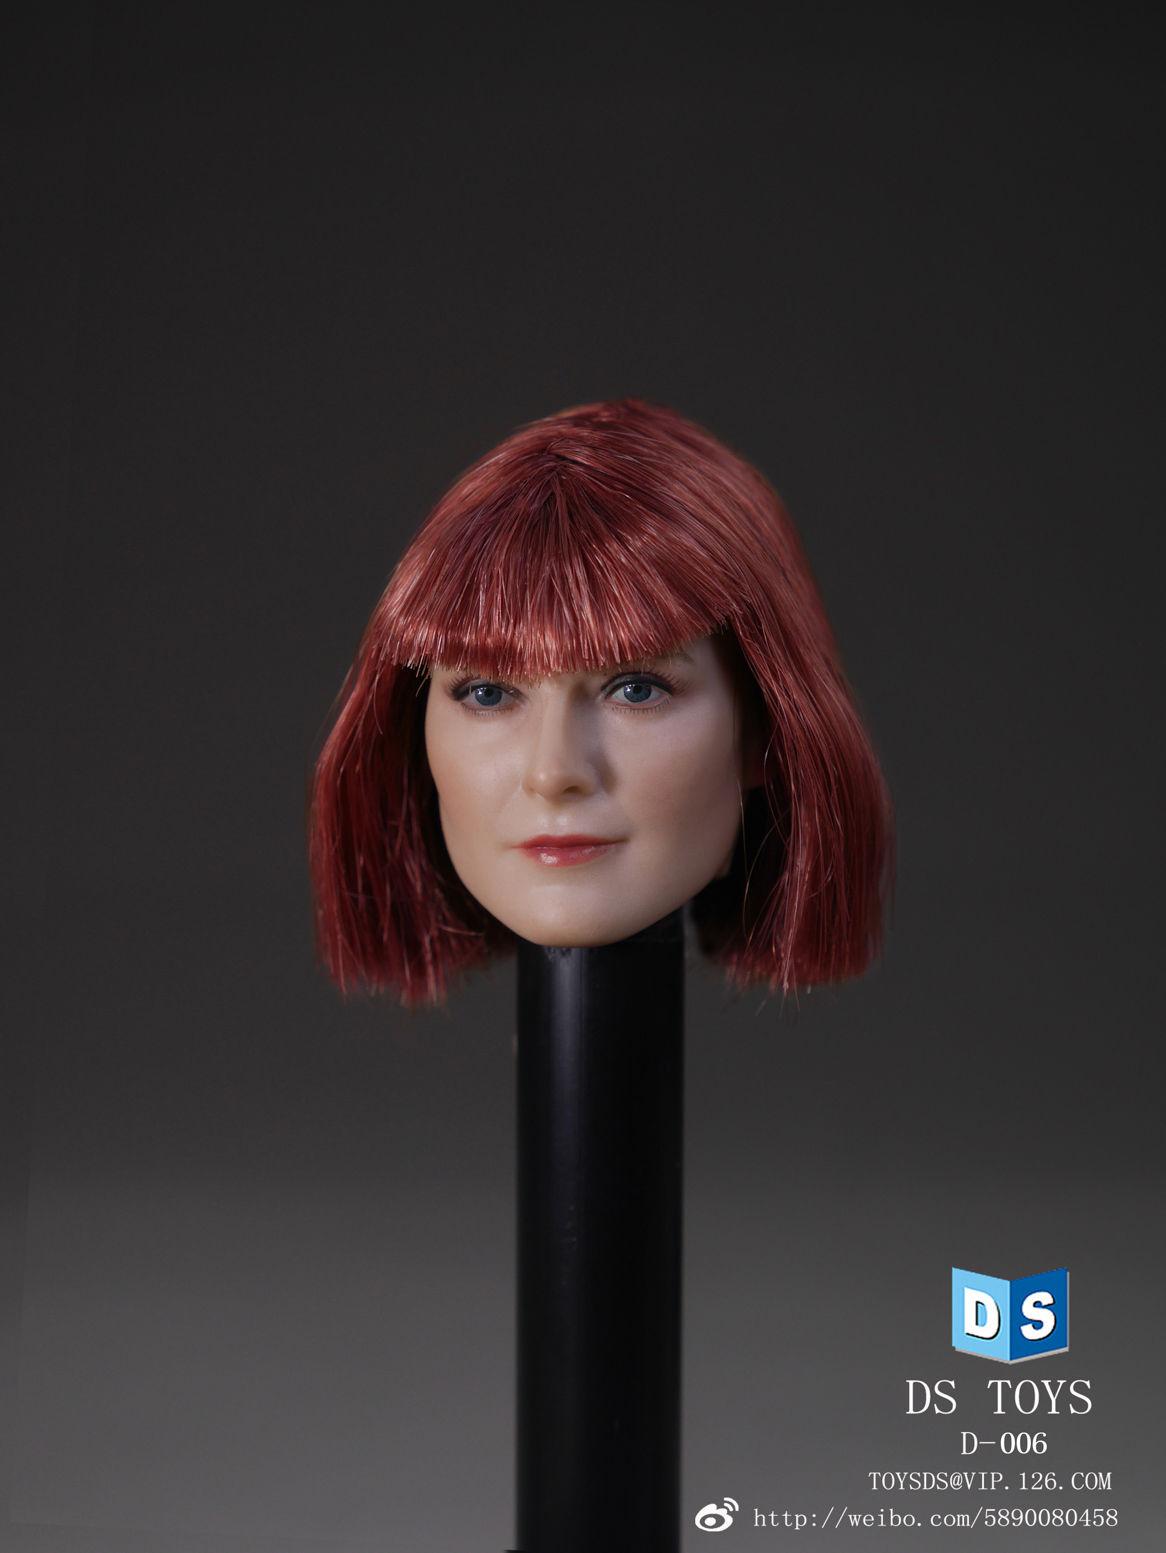 1:6 Scale DSTOYS D-006 Female Short Hair Head Sculpt